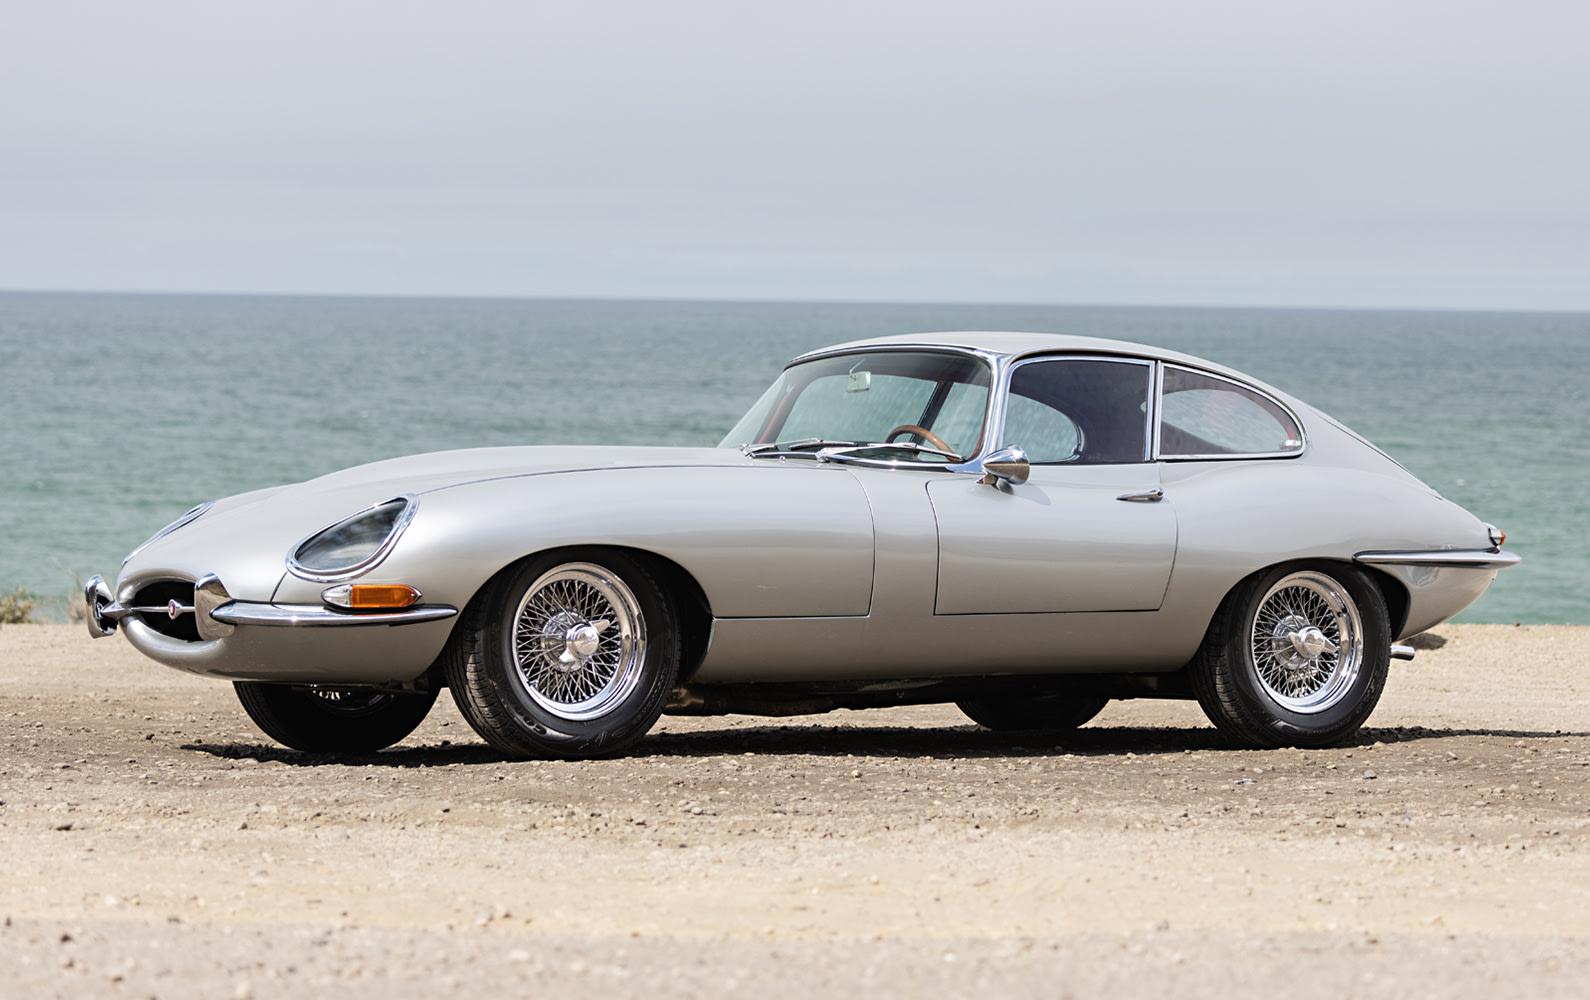 1964 Jaguar E-Type Series I 3.8-Litre Fixed Head Coupe (1)